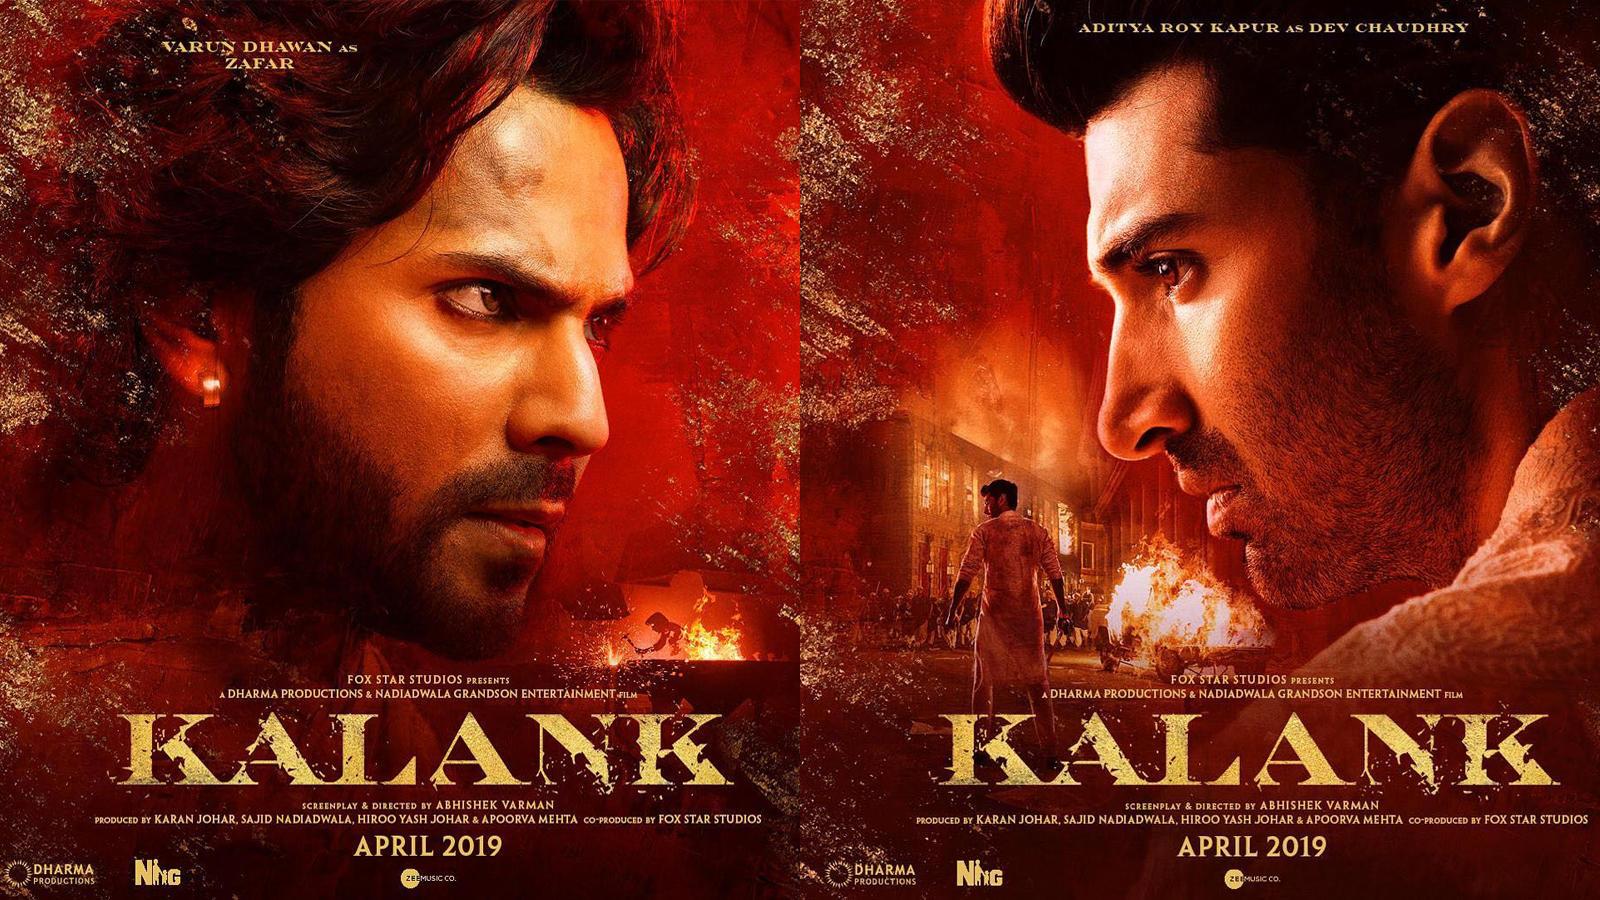 Karan Johar shares first glimpse of 'Kalank', remembers his father Yash Johar